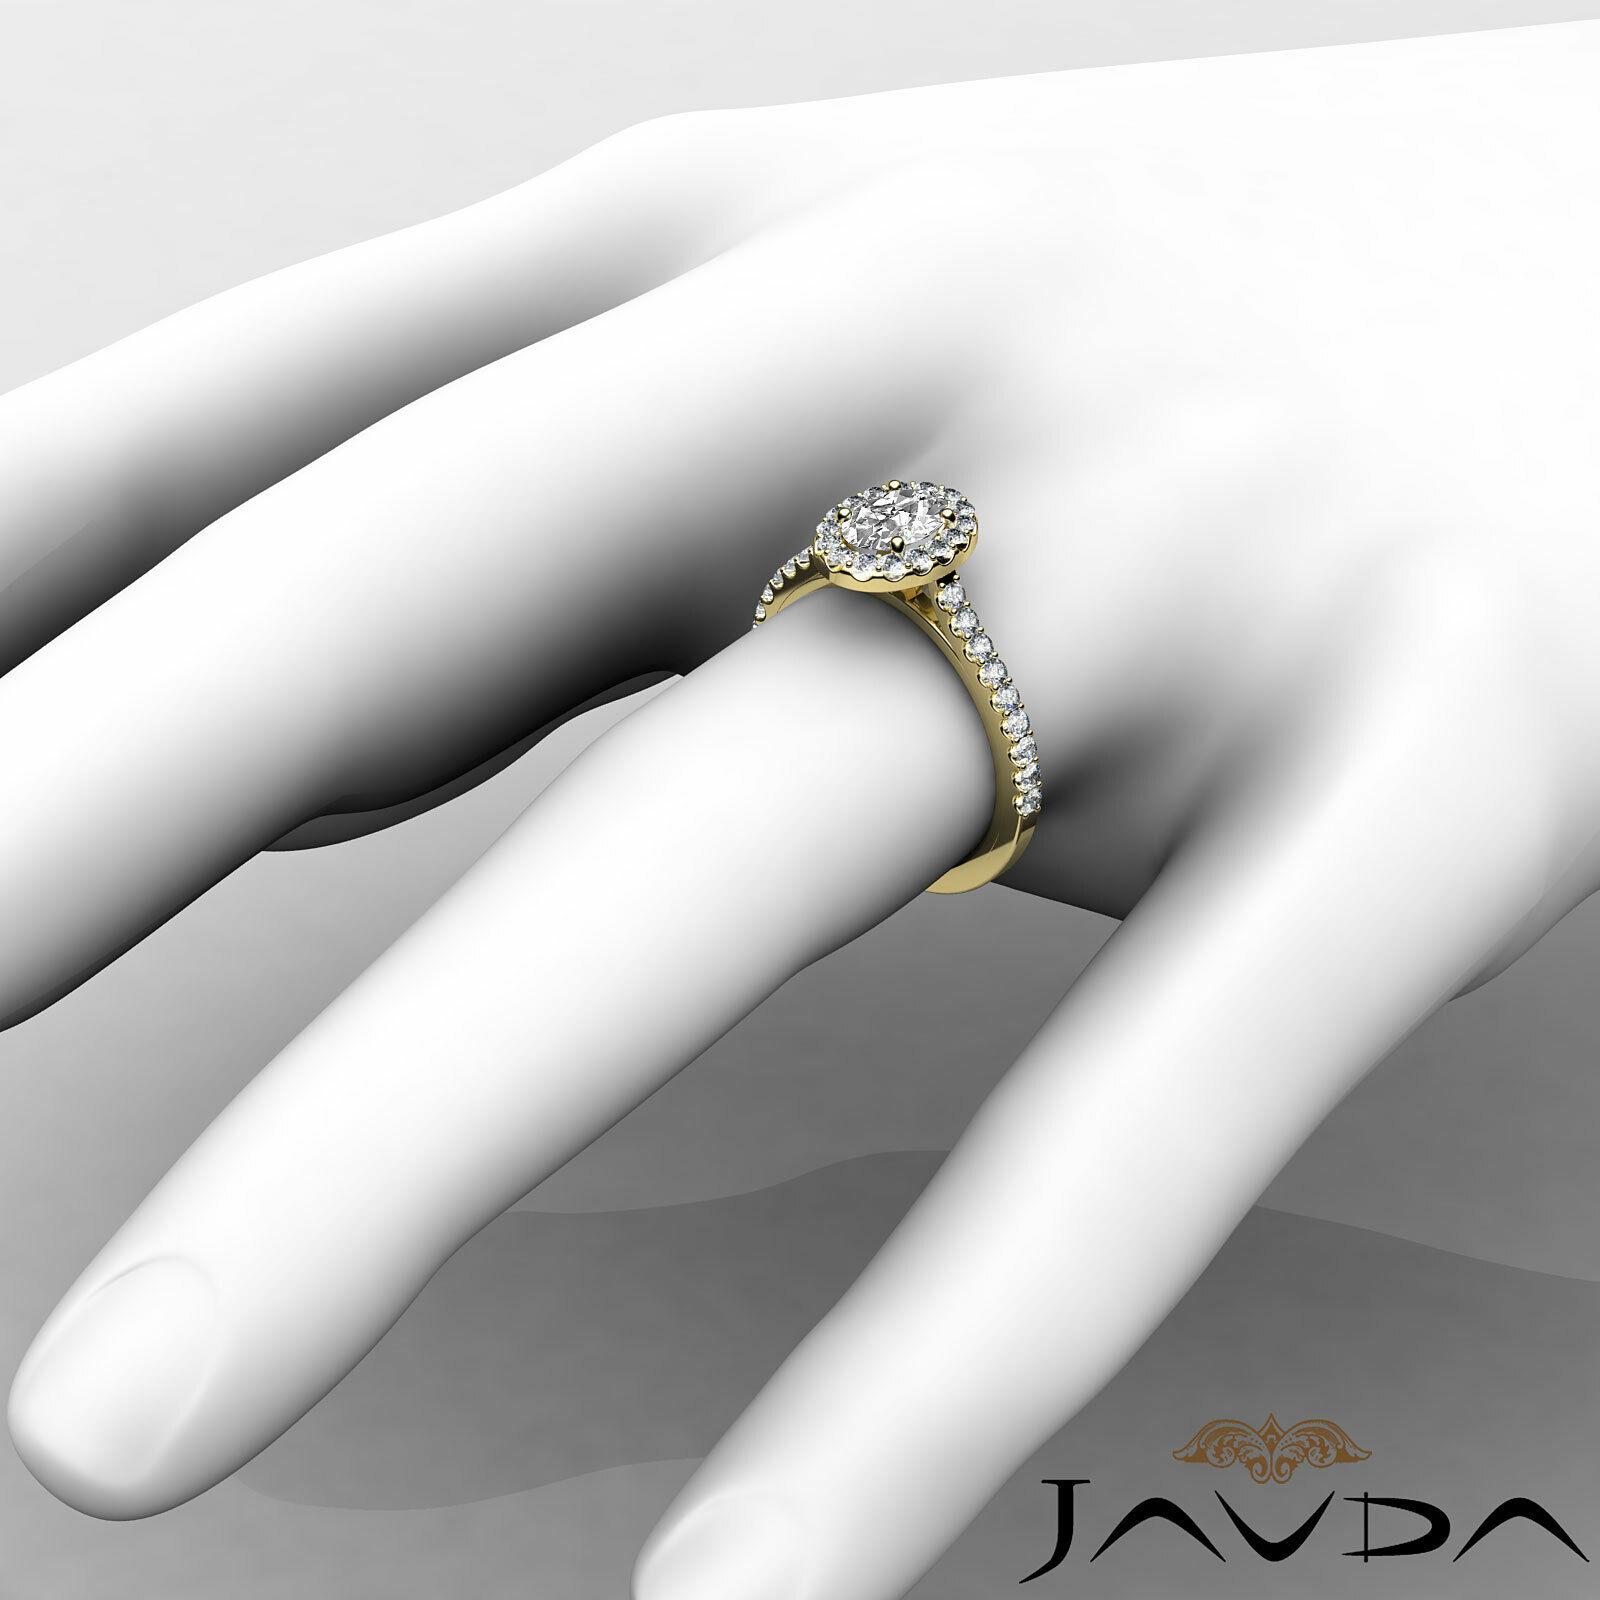 1.6ctw Prong Setting Oval Diamond Engagement Ring GIA H-VS1 White Gold Women New 11